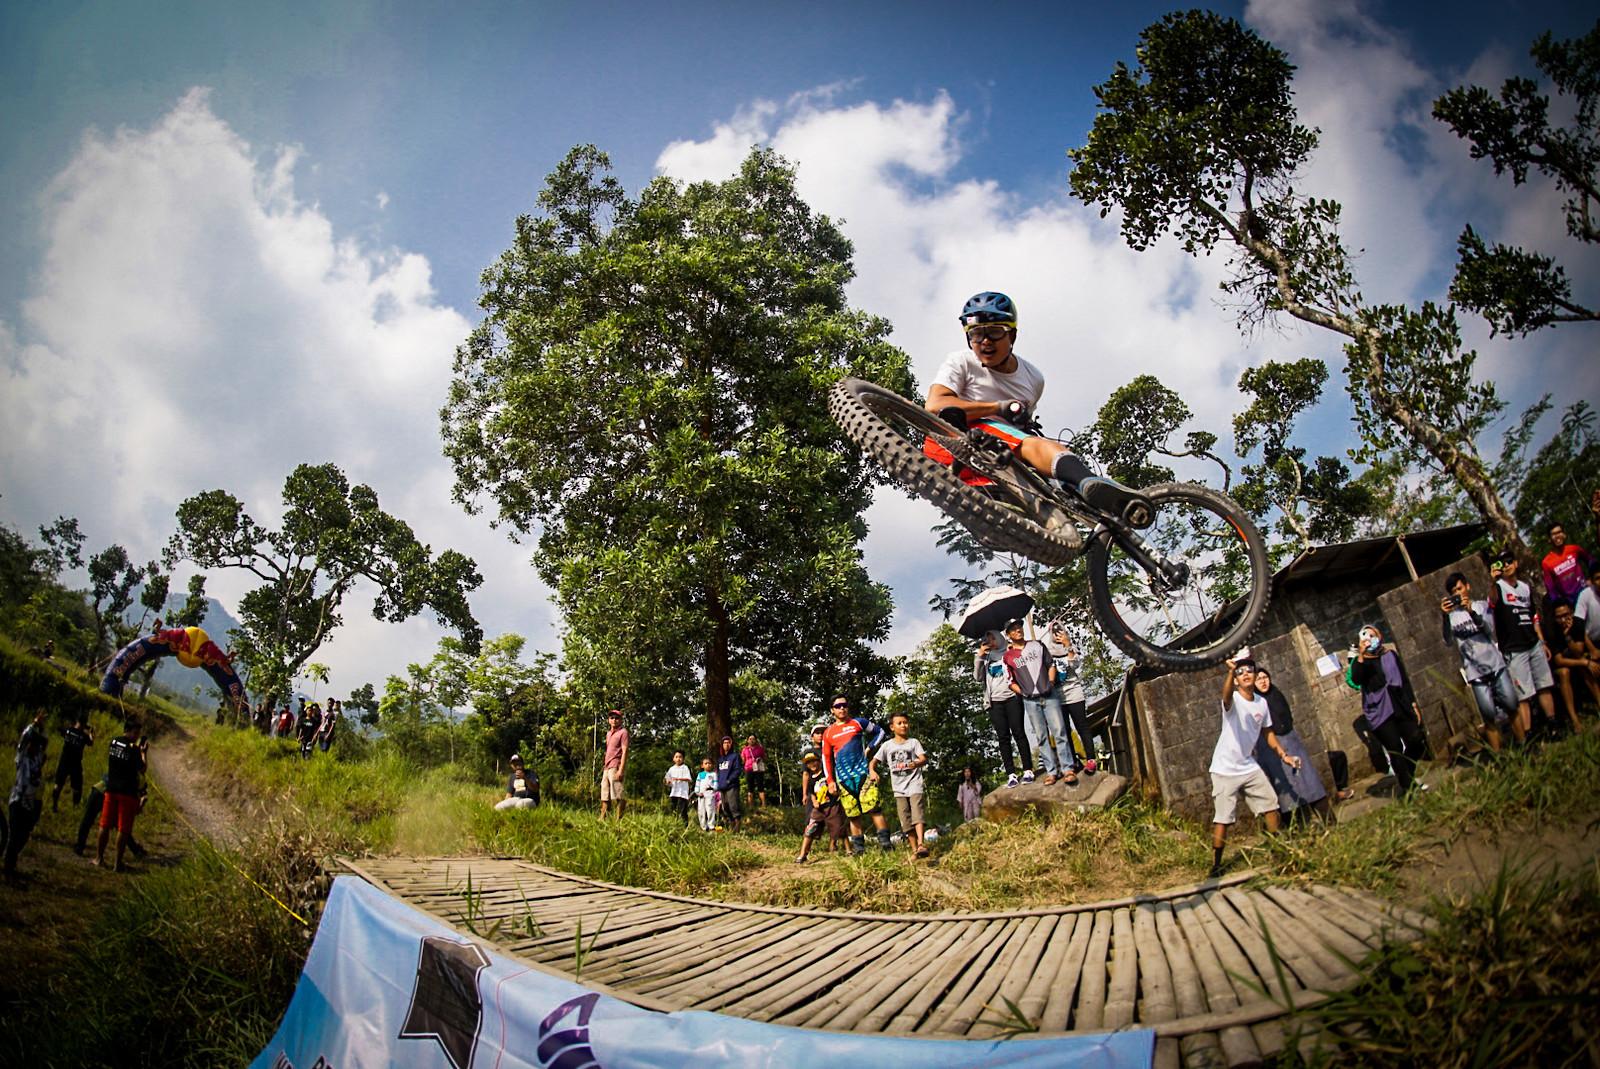 Whip it weekend - RezaAkhmad - Mountain Biking Pictures - Vital MTB